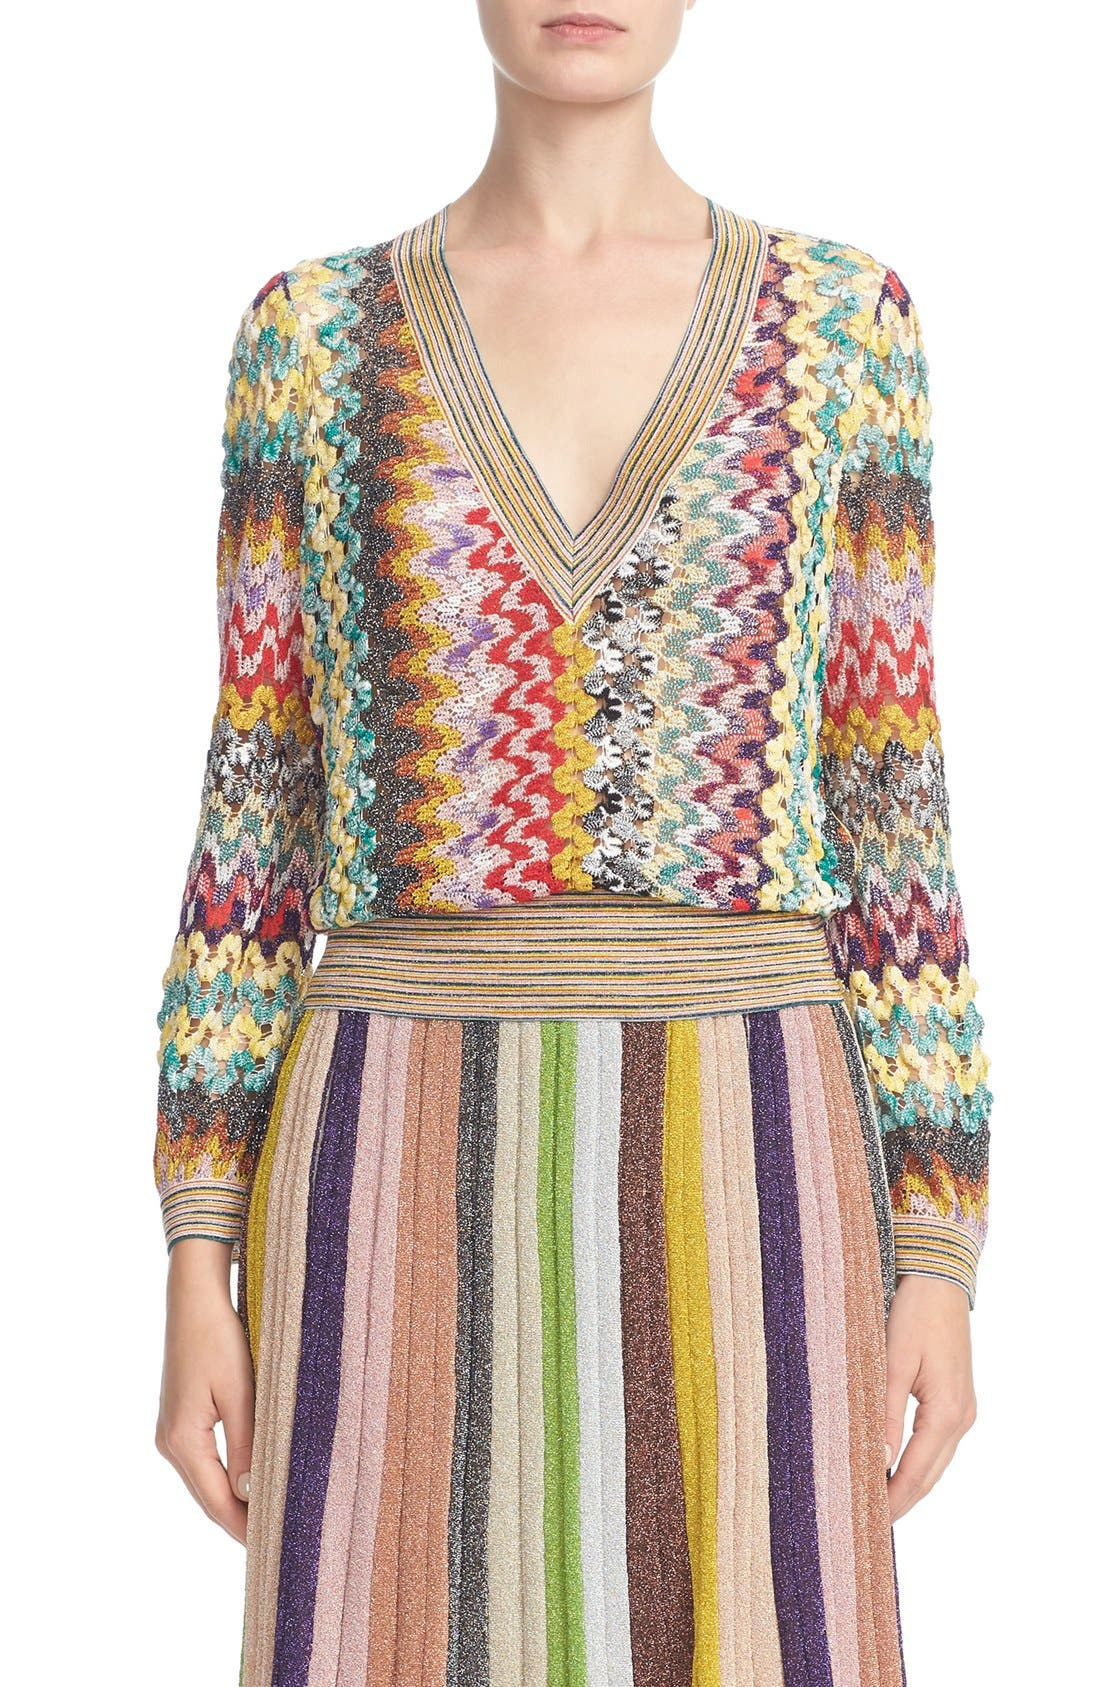 Alternate Image 1 Selected - Missoni Metallic Knit Sweater